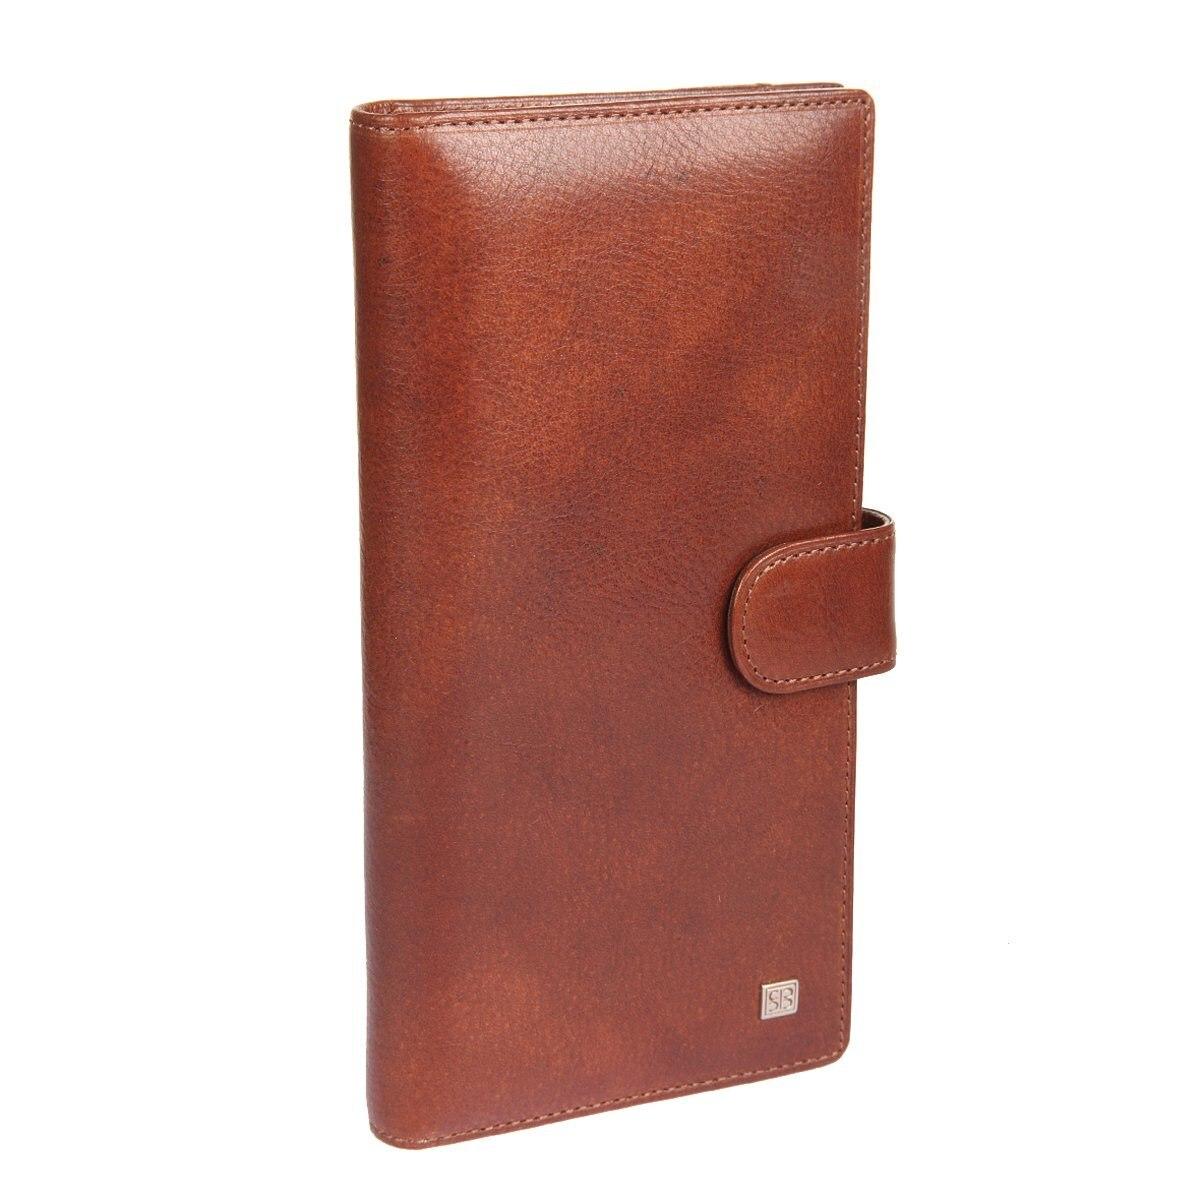 Coin Purse Sergio Belotti 3285 Oro Brown simple retro split leather coin purse w belt buckle brown